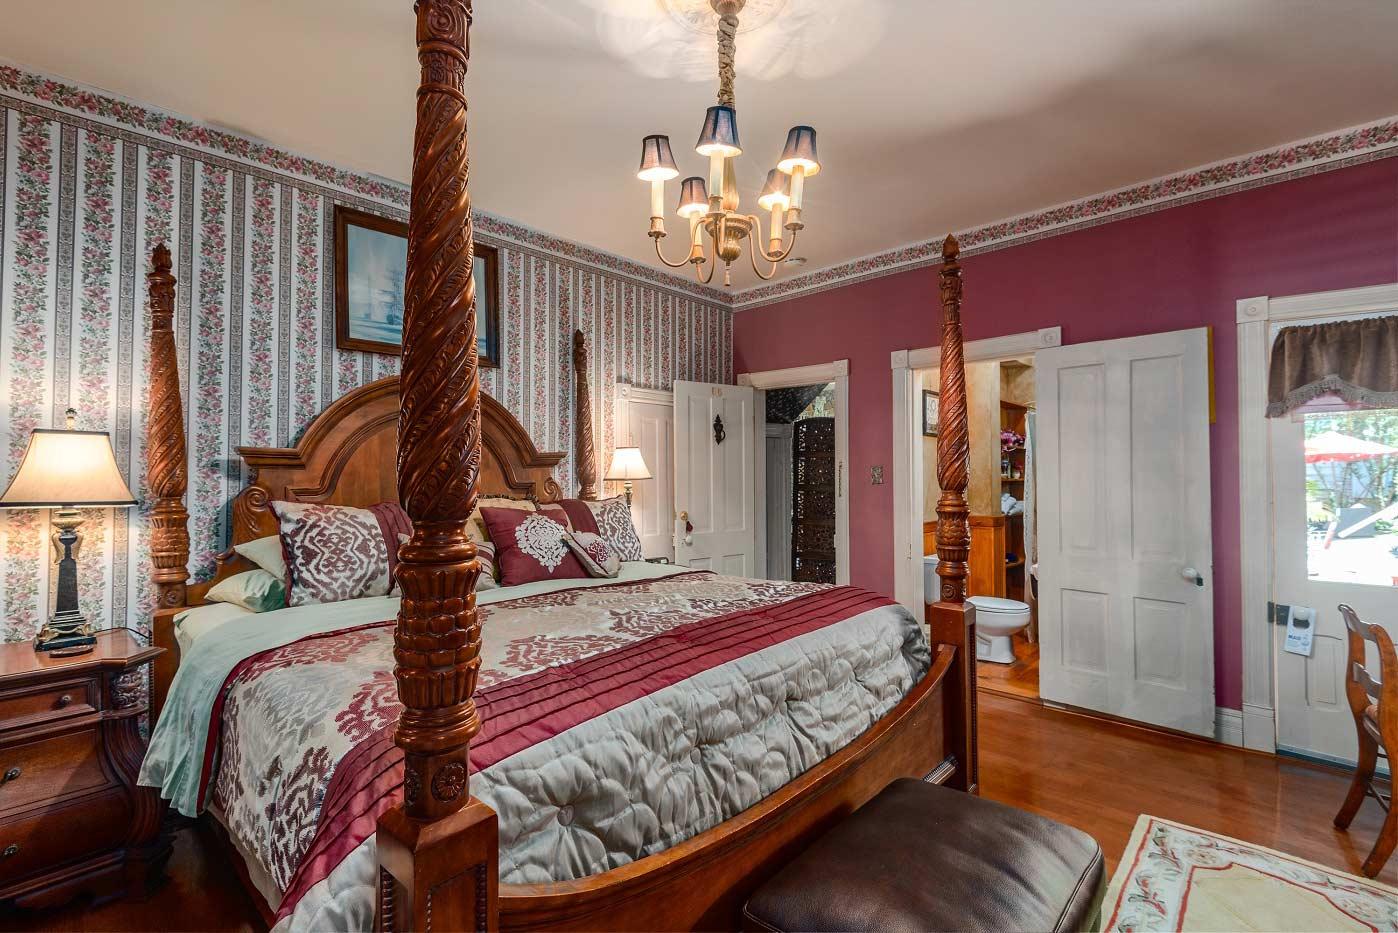 Captain Bridgeford Room King Bed